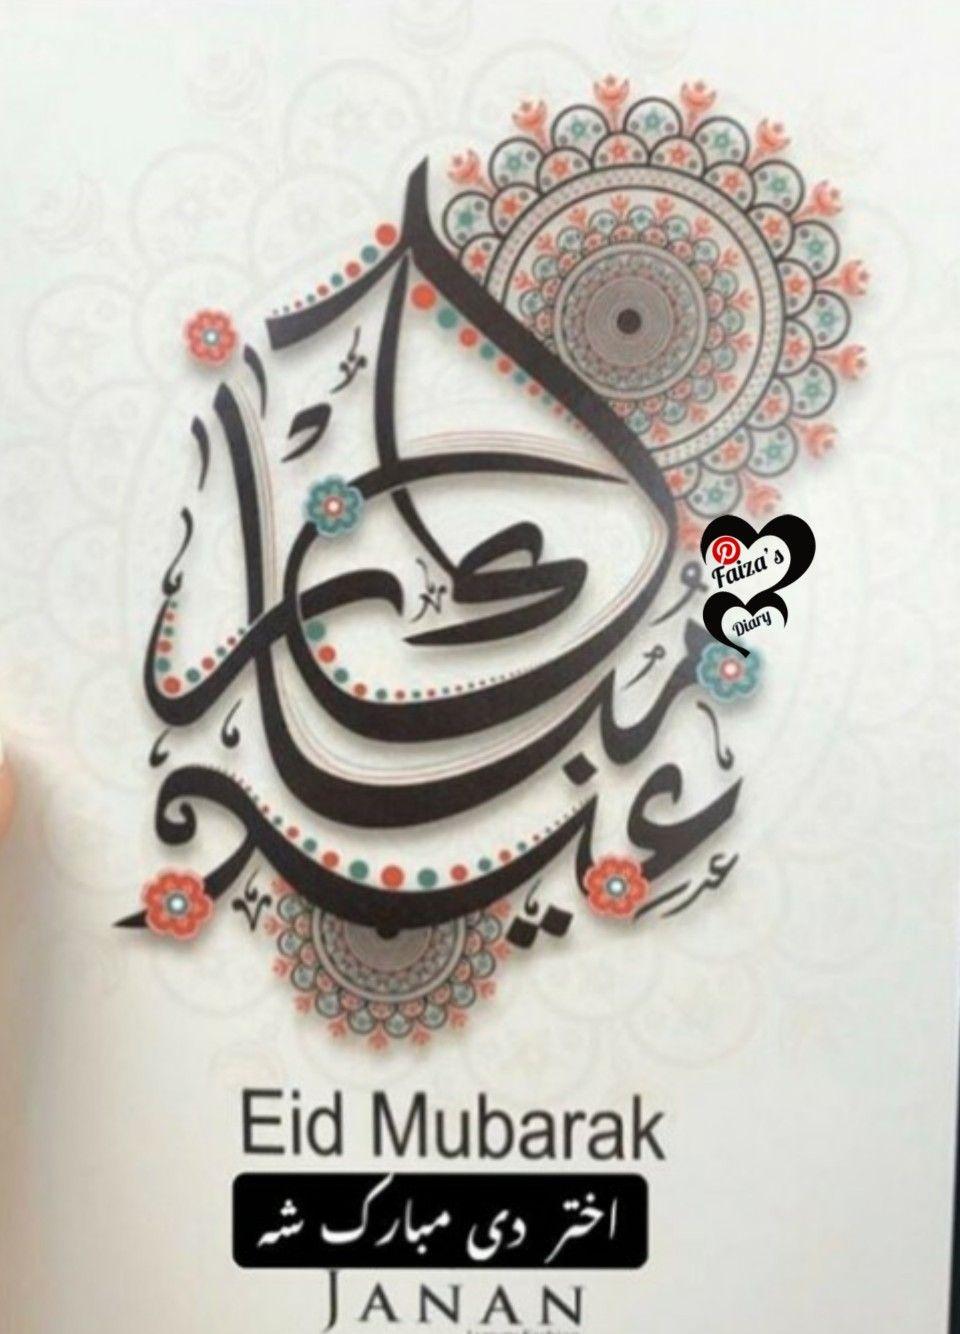 Eid Mubarak اختر دی مبارک شہ جانانہ Hajj Mubarak Eid Mubarak Ramadan Mubarak